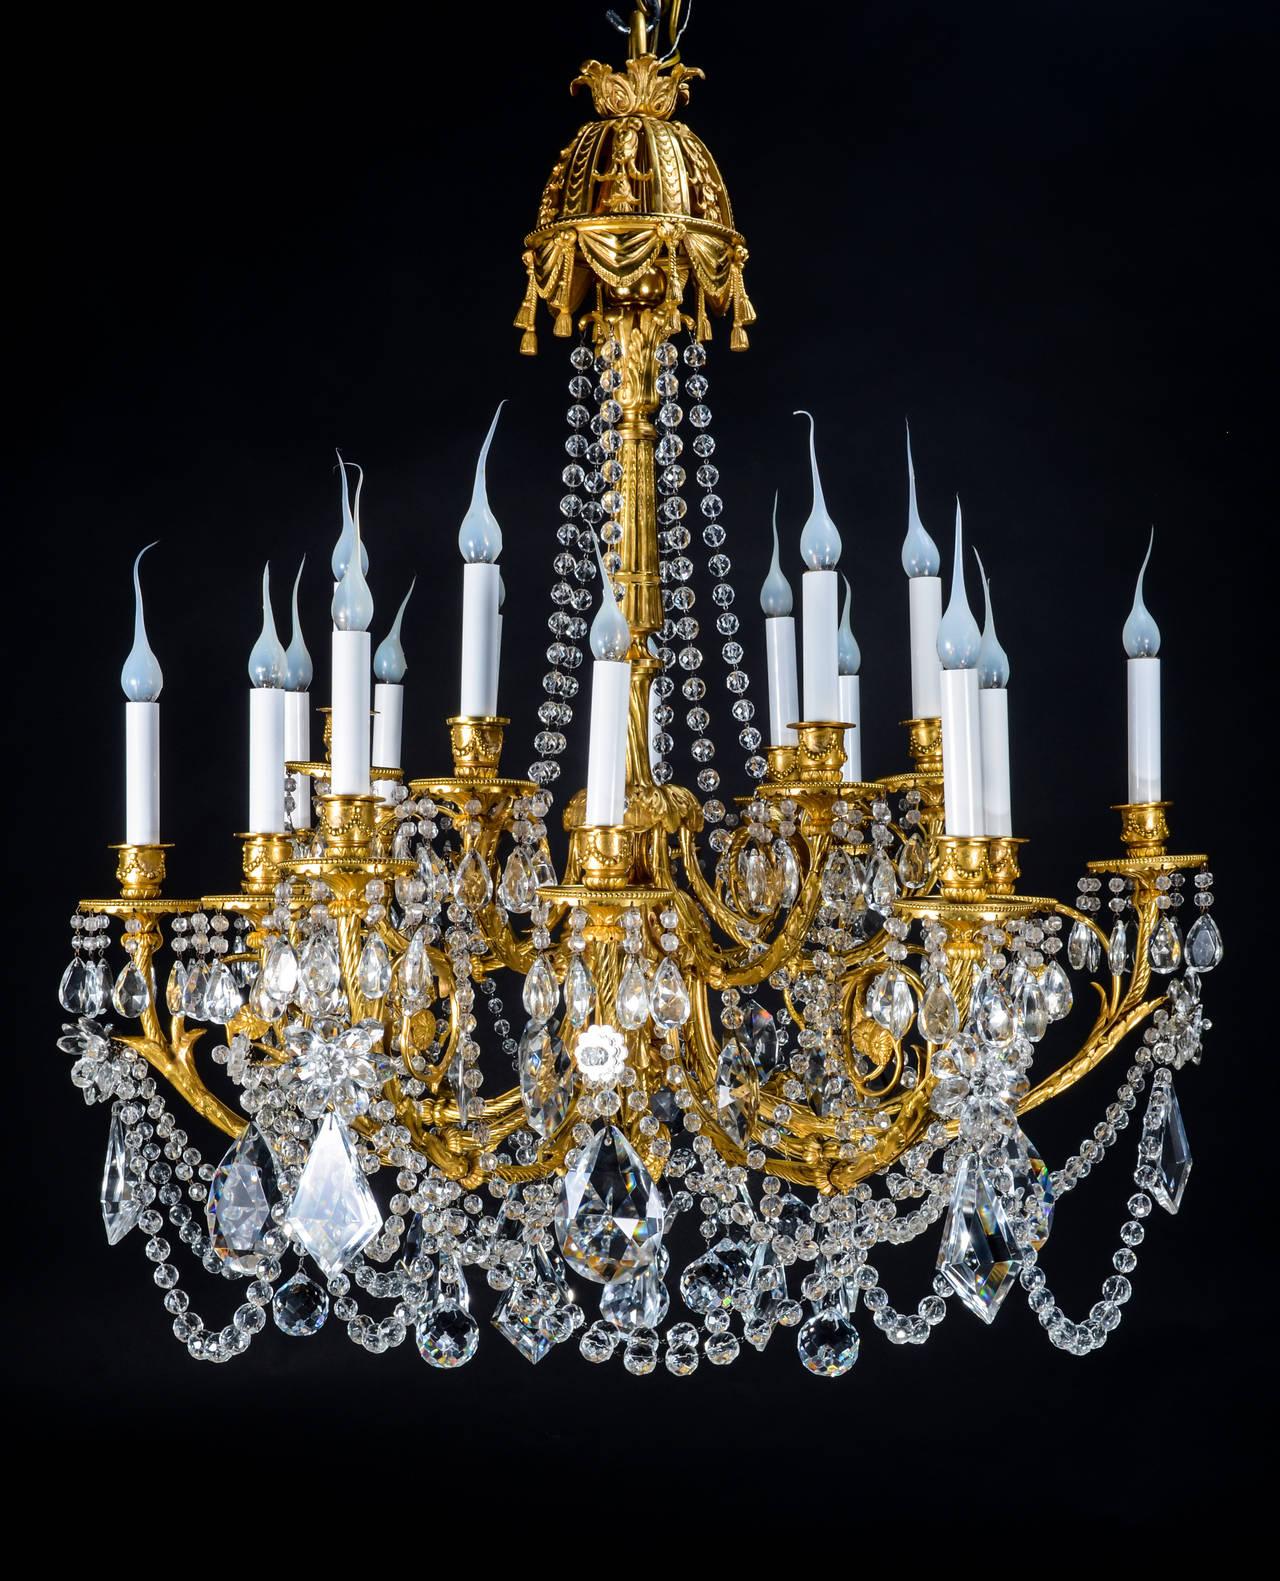 Superb Antique French Louis XVI Style Gilt Bronze and Crystal Chandelier 2 - Superb Antique French Louis XVI Style Gilt Bronze And Crystal